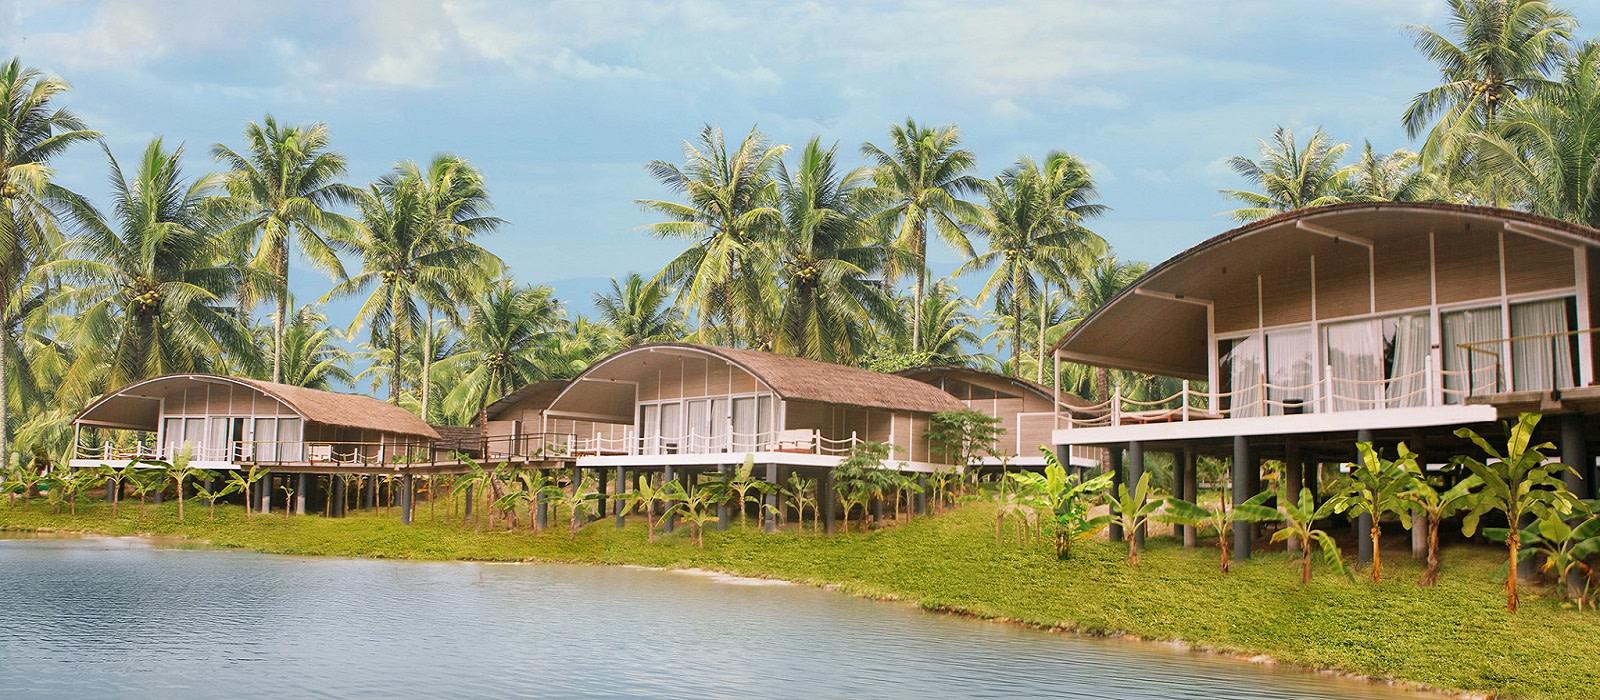 Hotel Taj Exotica Resort & Spa Inseln & Strände